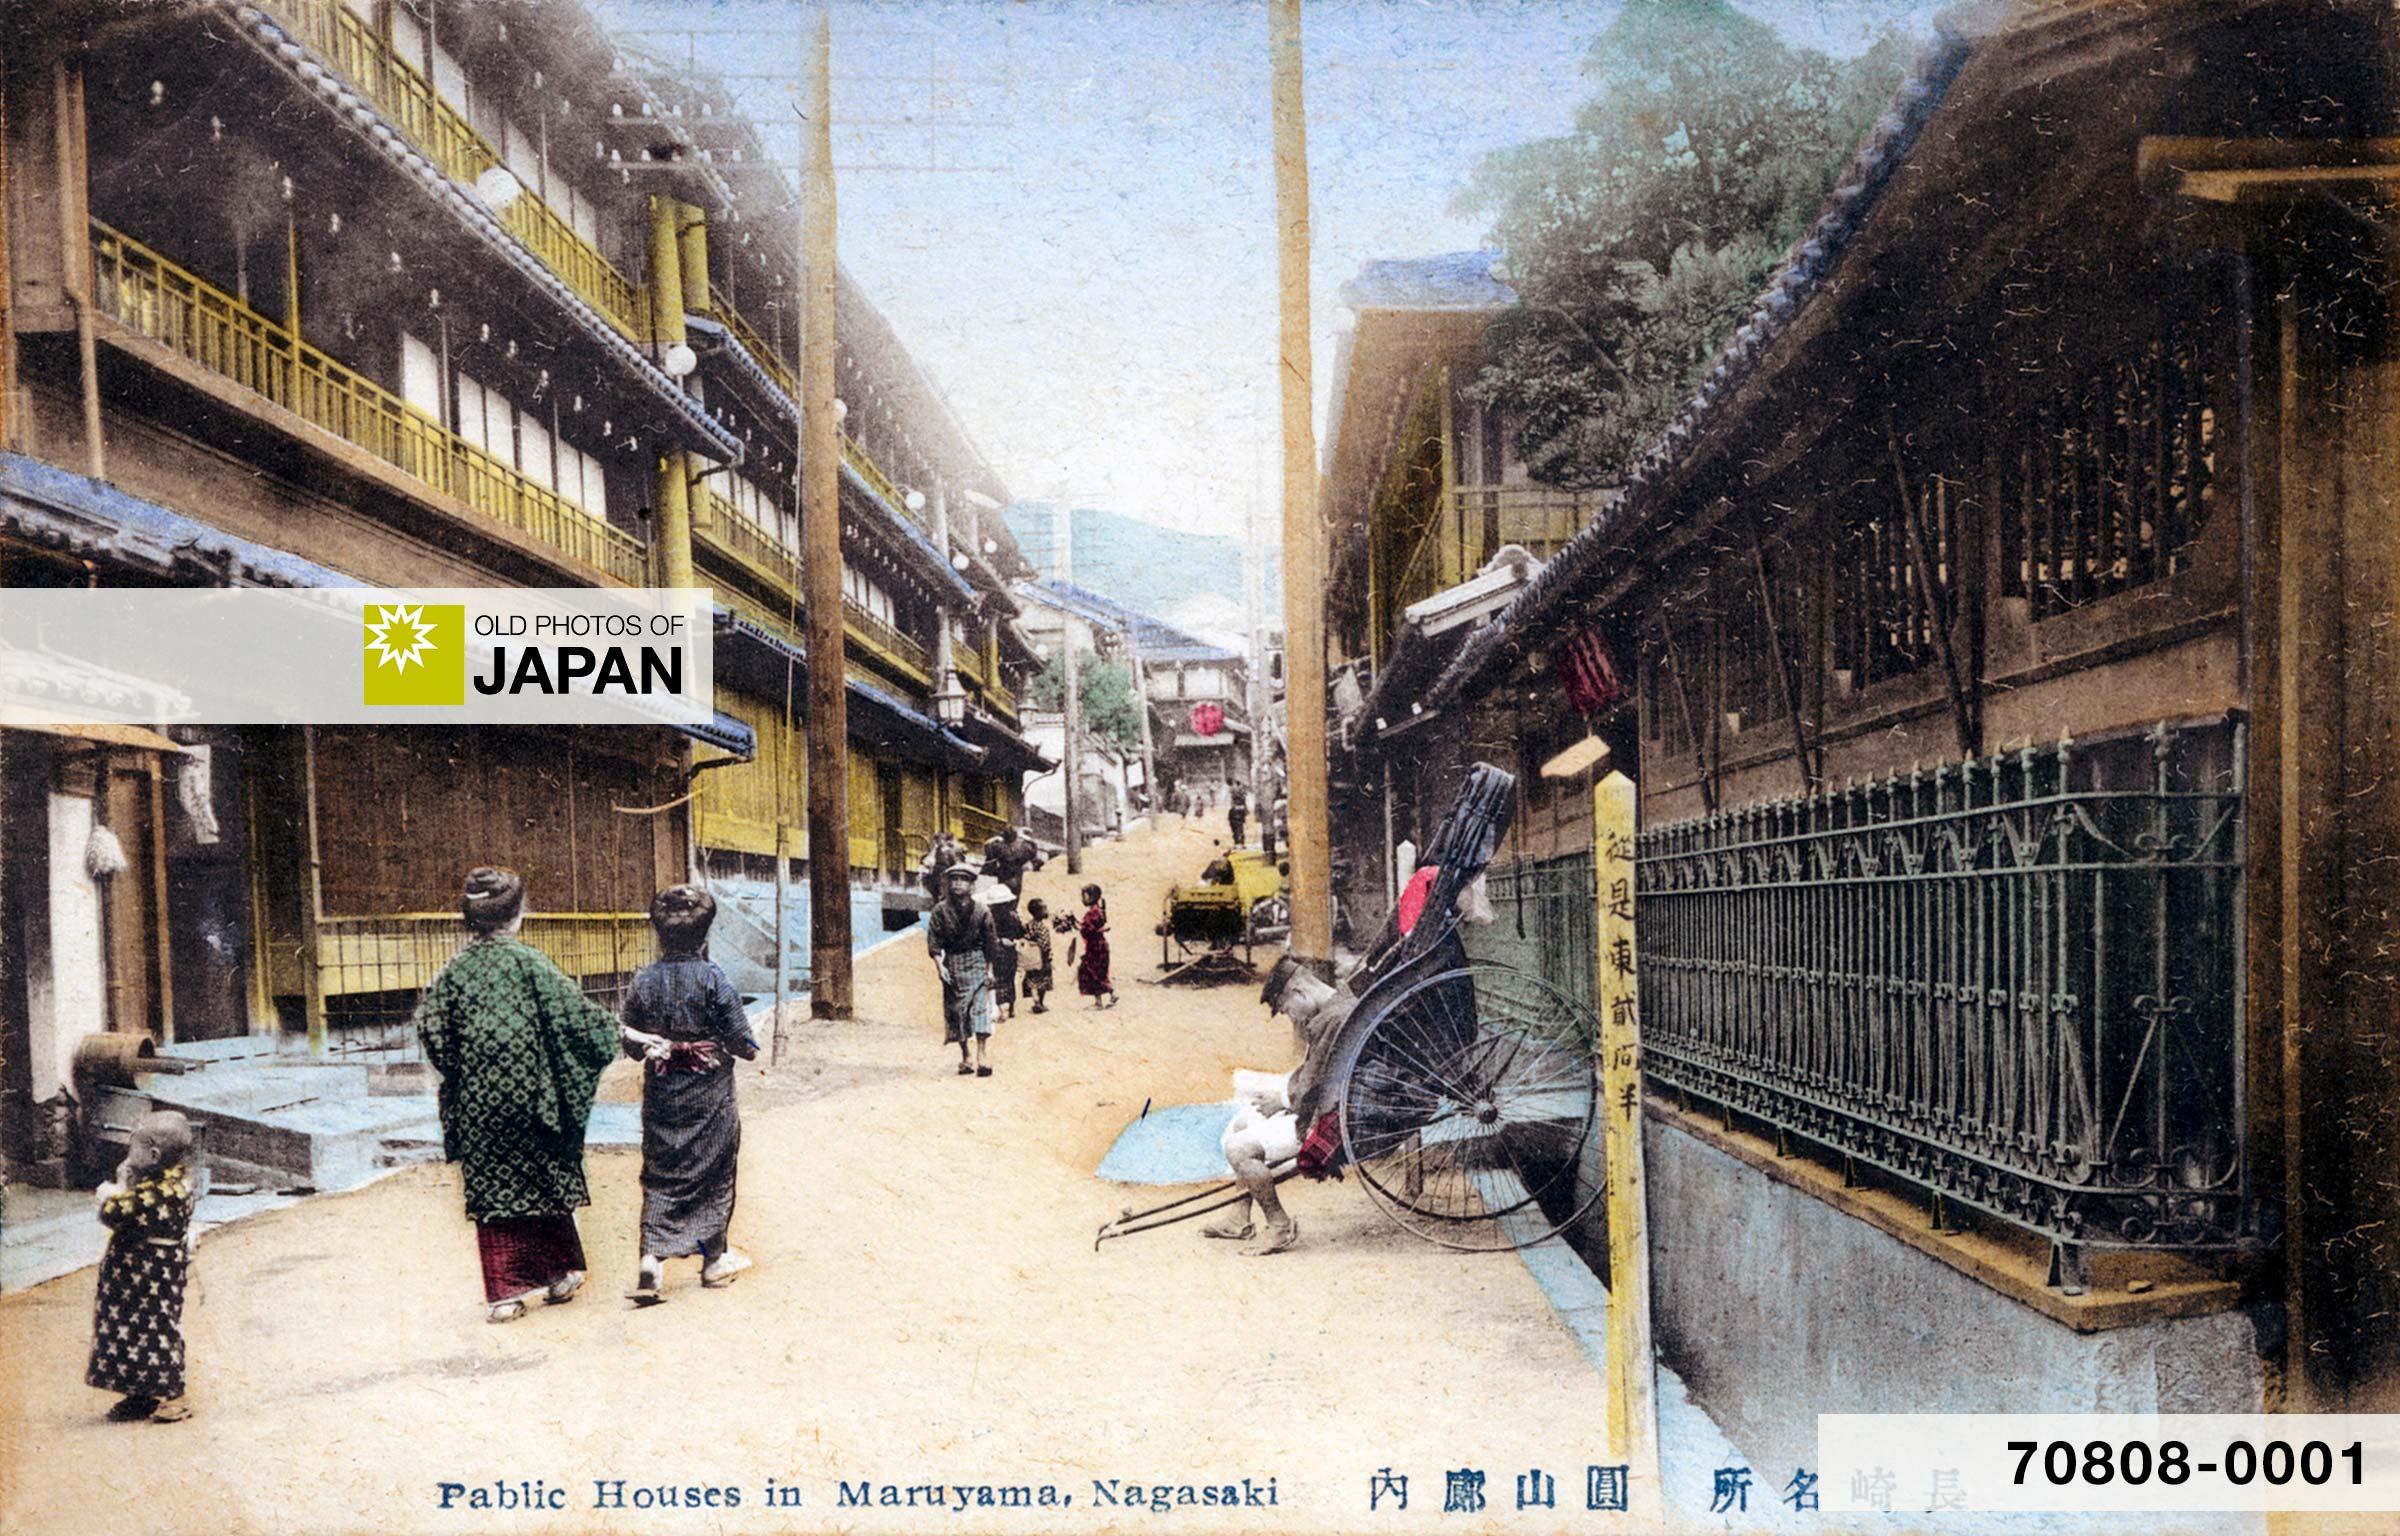 Maruyama Brothel District, Nagasaki